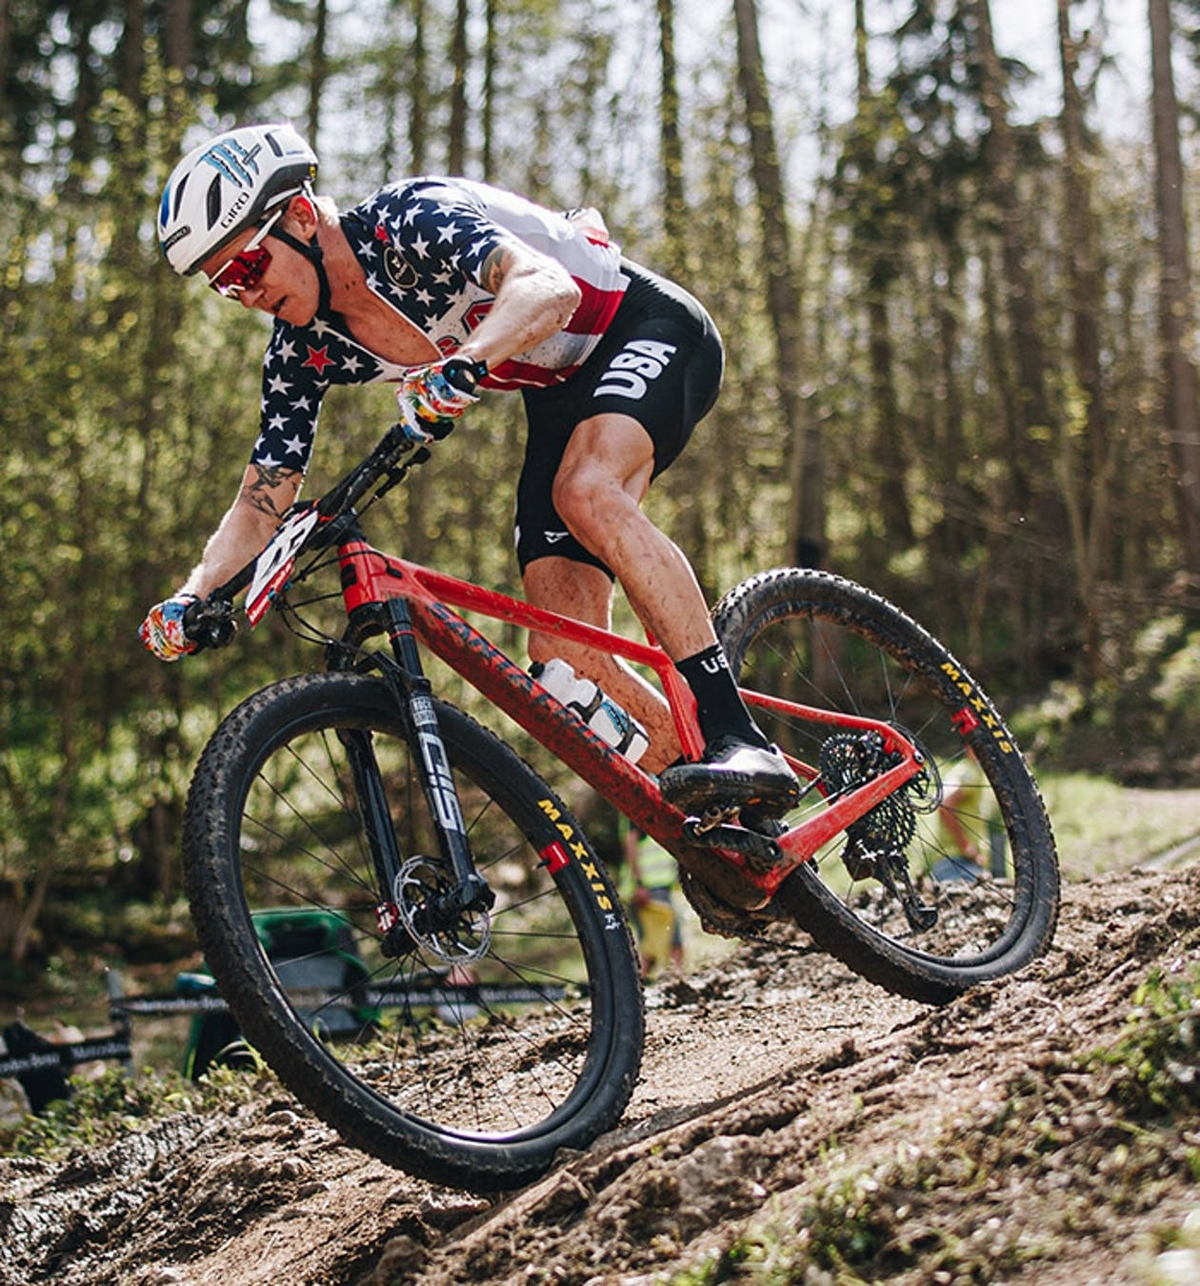 Keegan Swenson riding the Santa Cruz Highball on a muddy race course